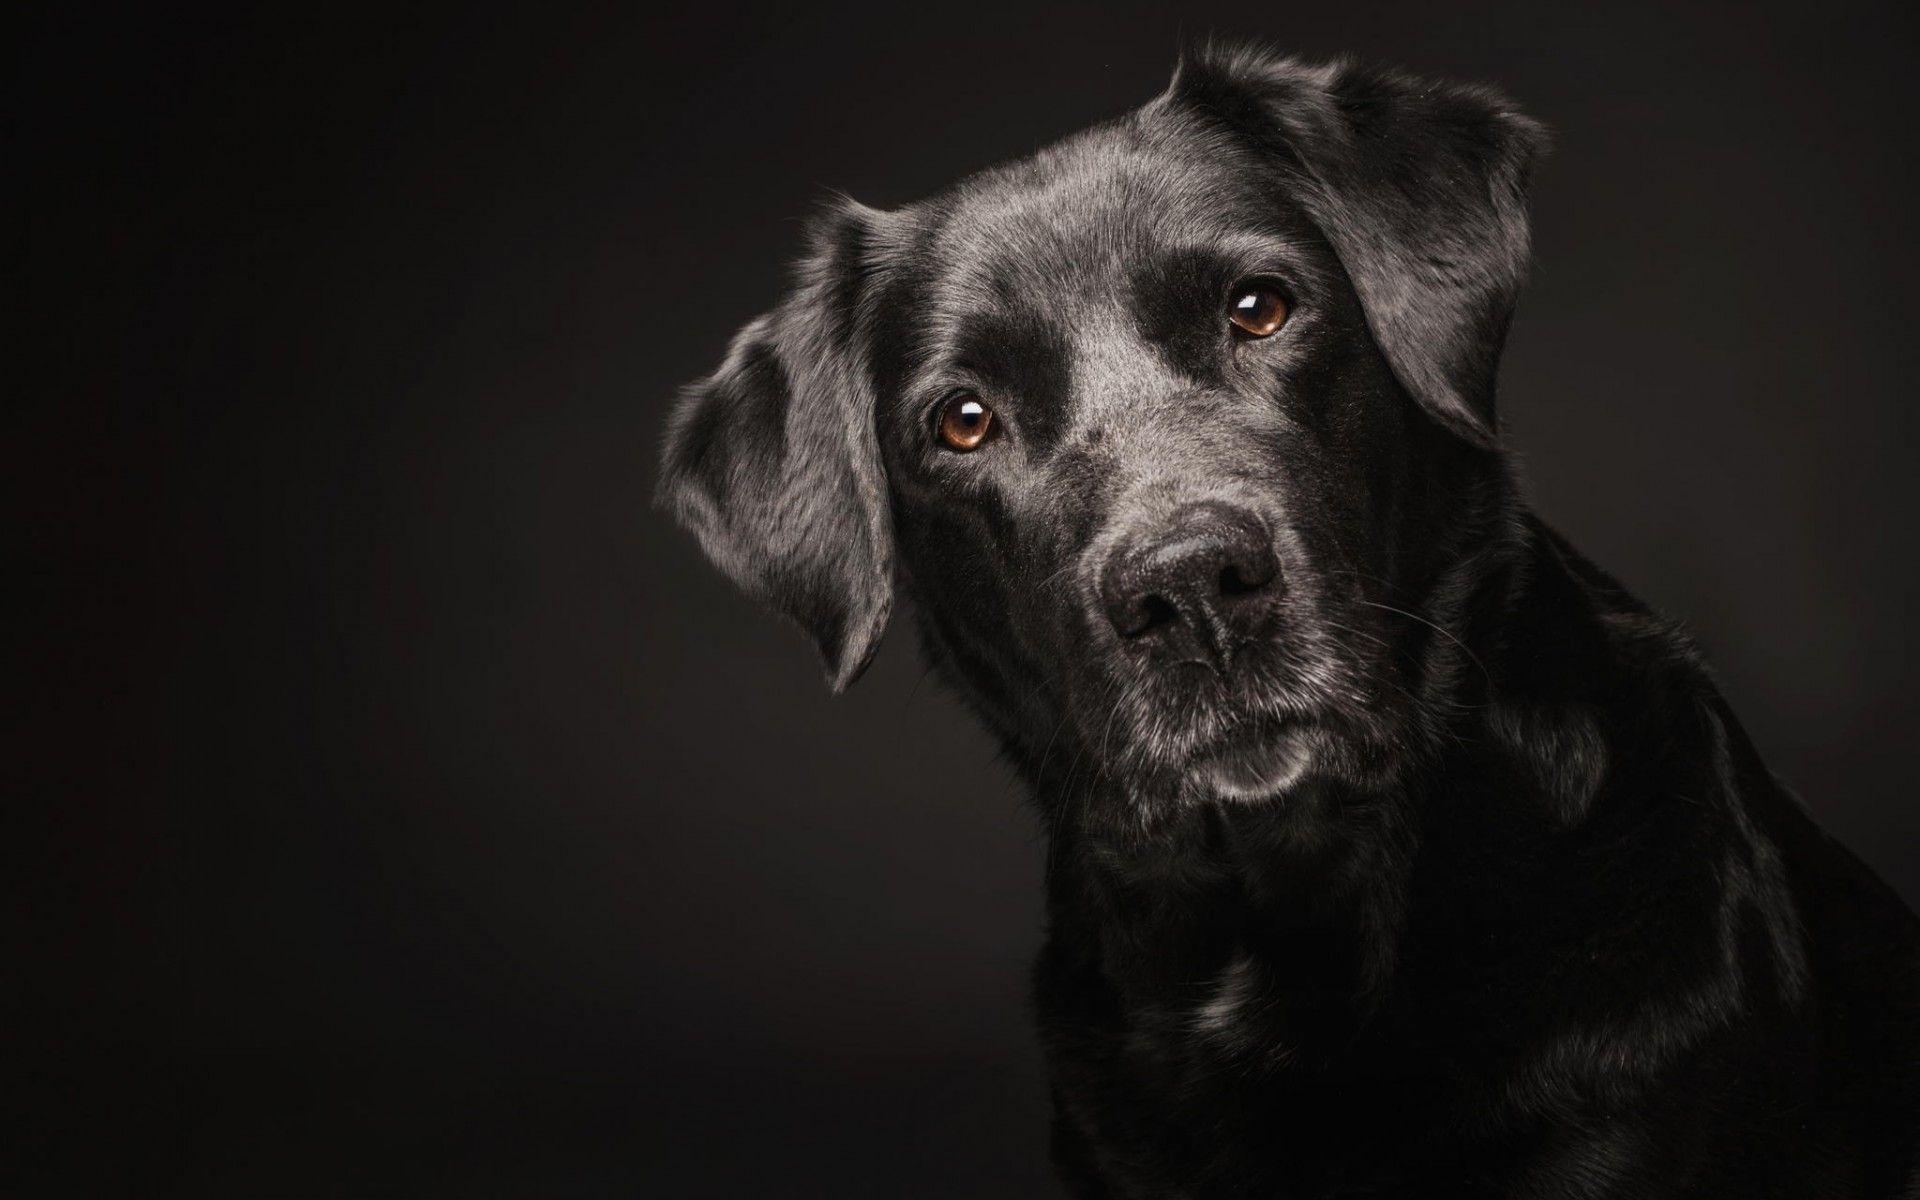 Black Dog Wallpapers Top Free Black Dog Backgrounds